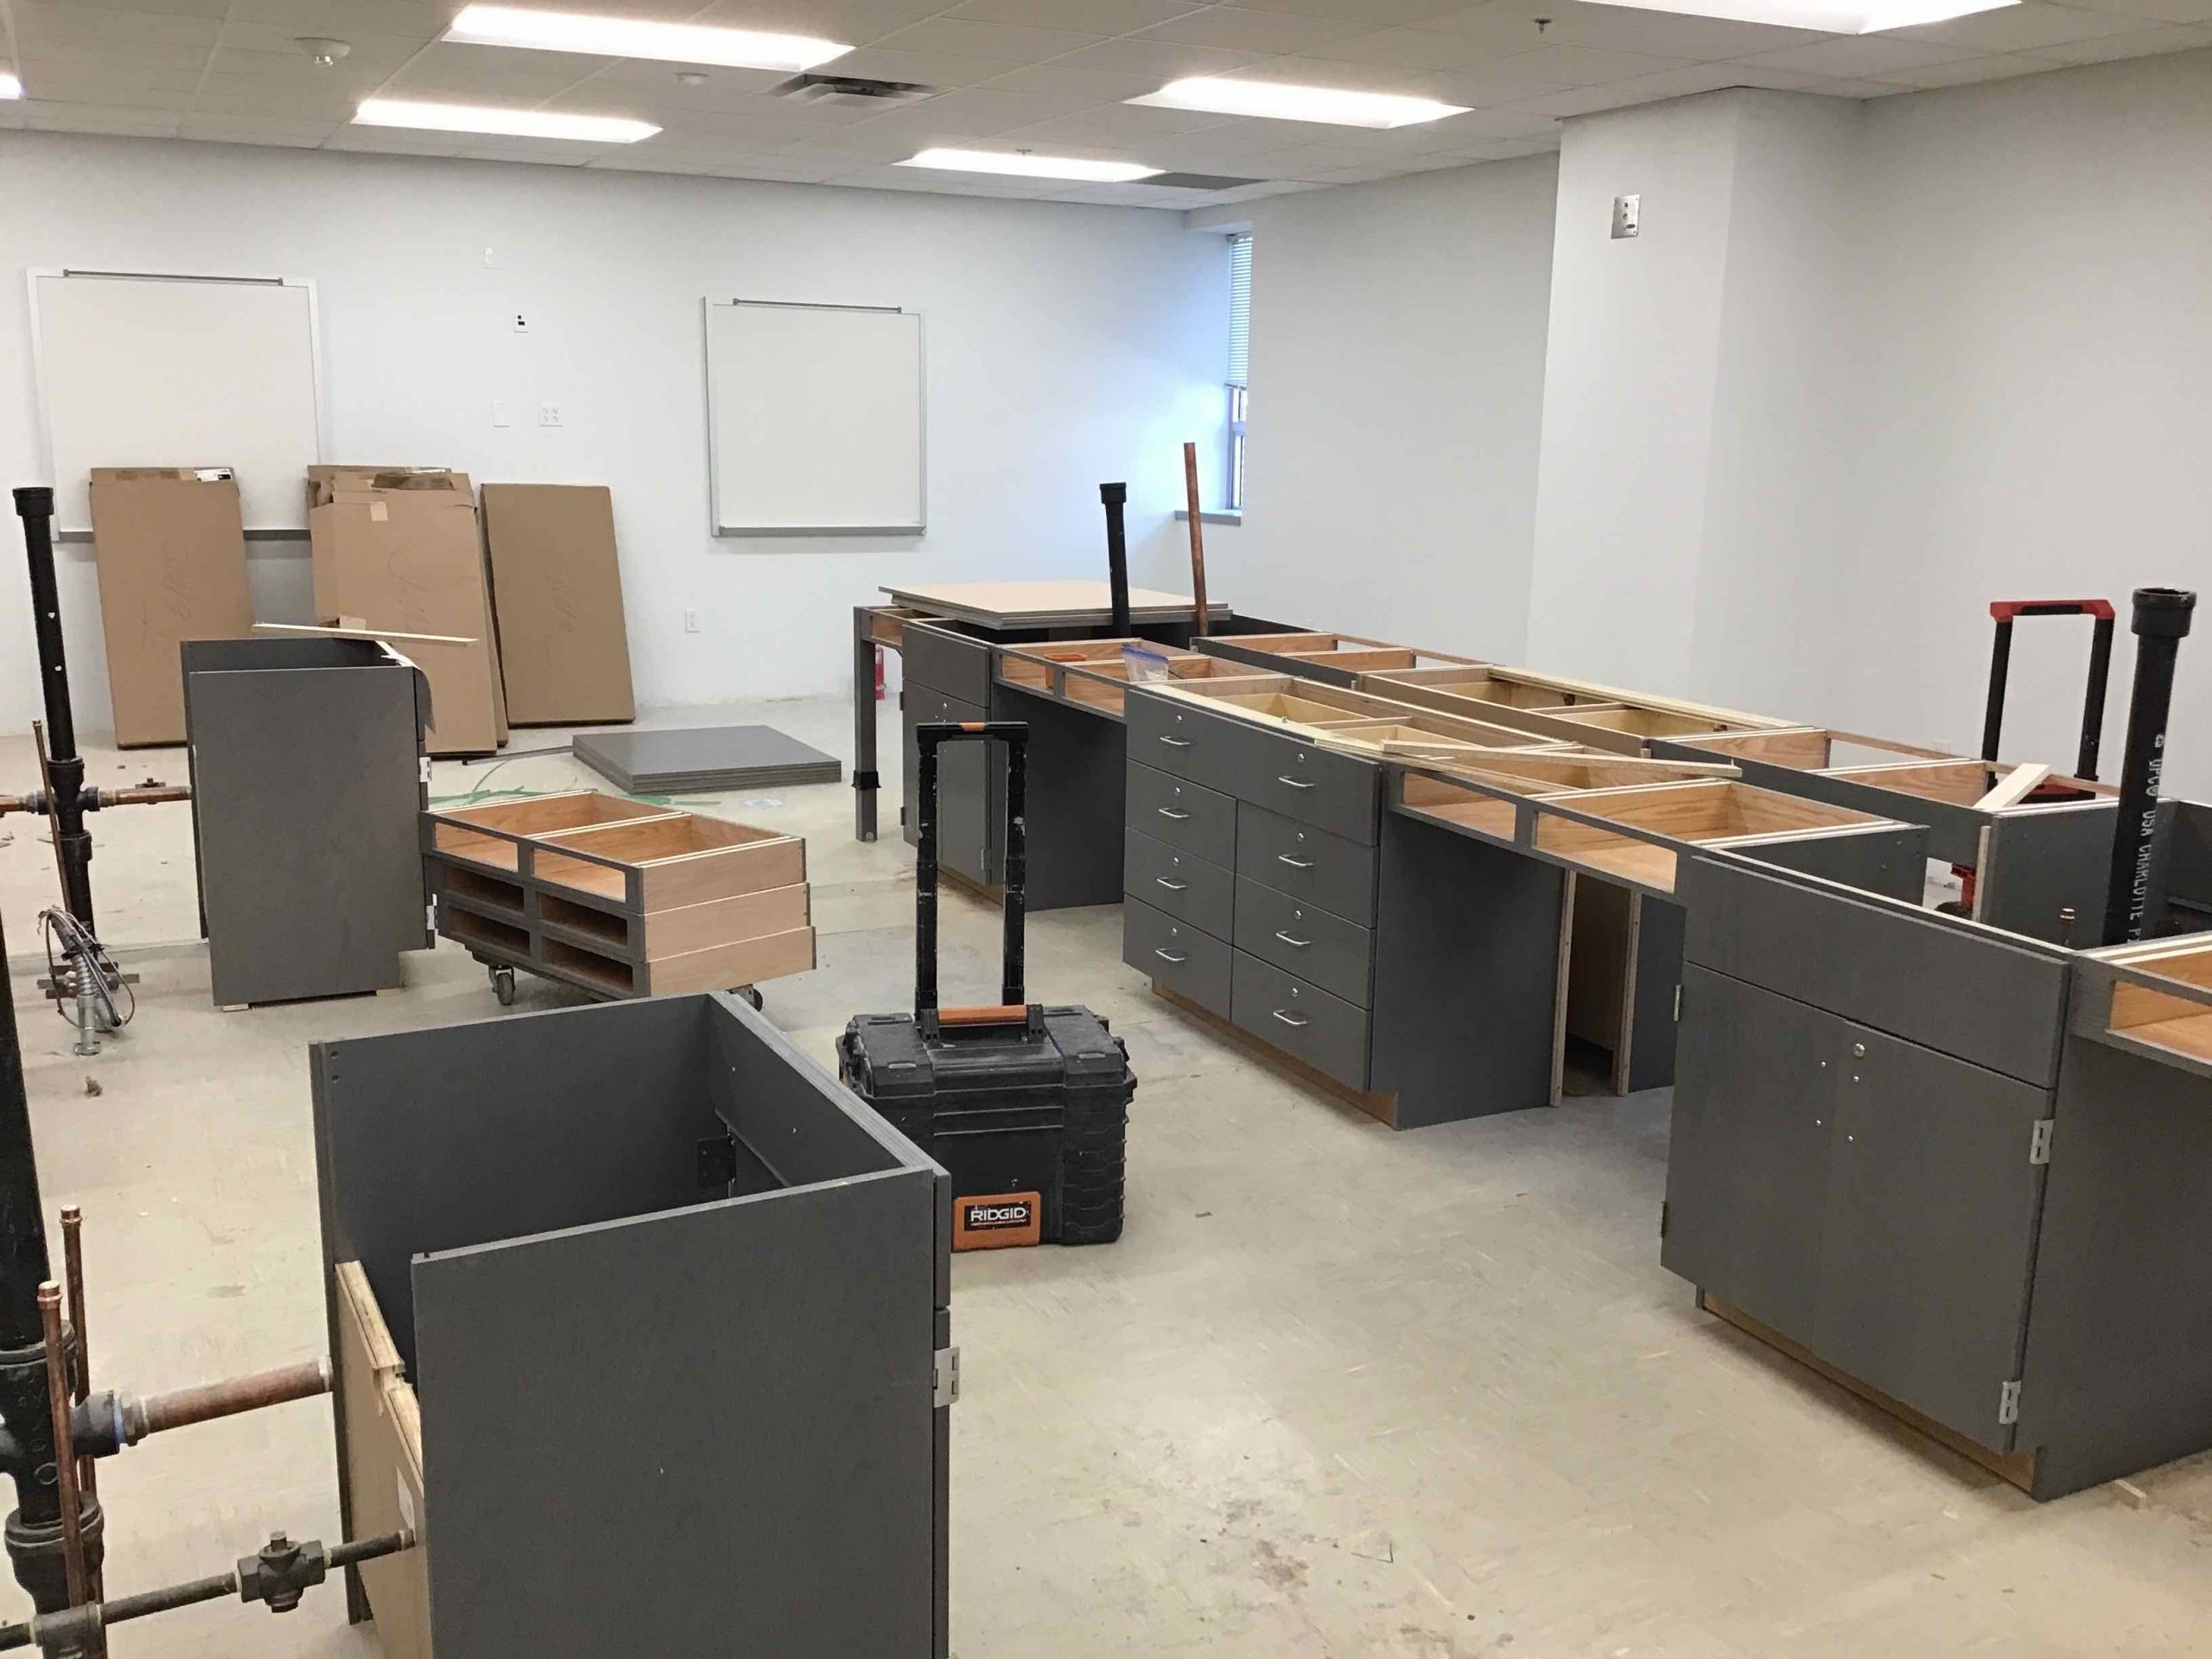 Classroom Millwork image 1